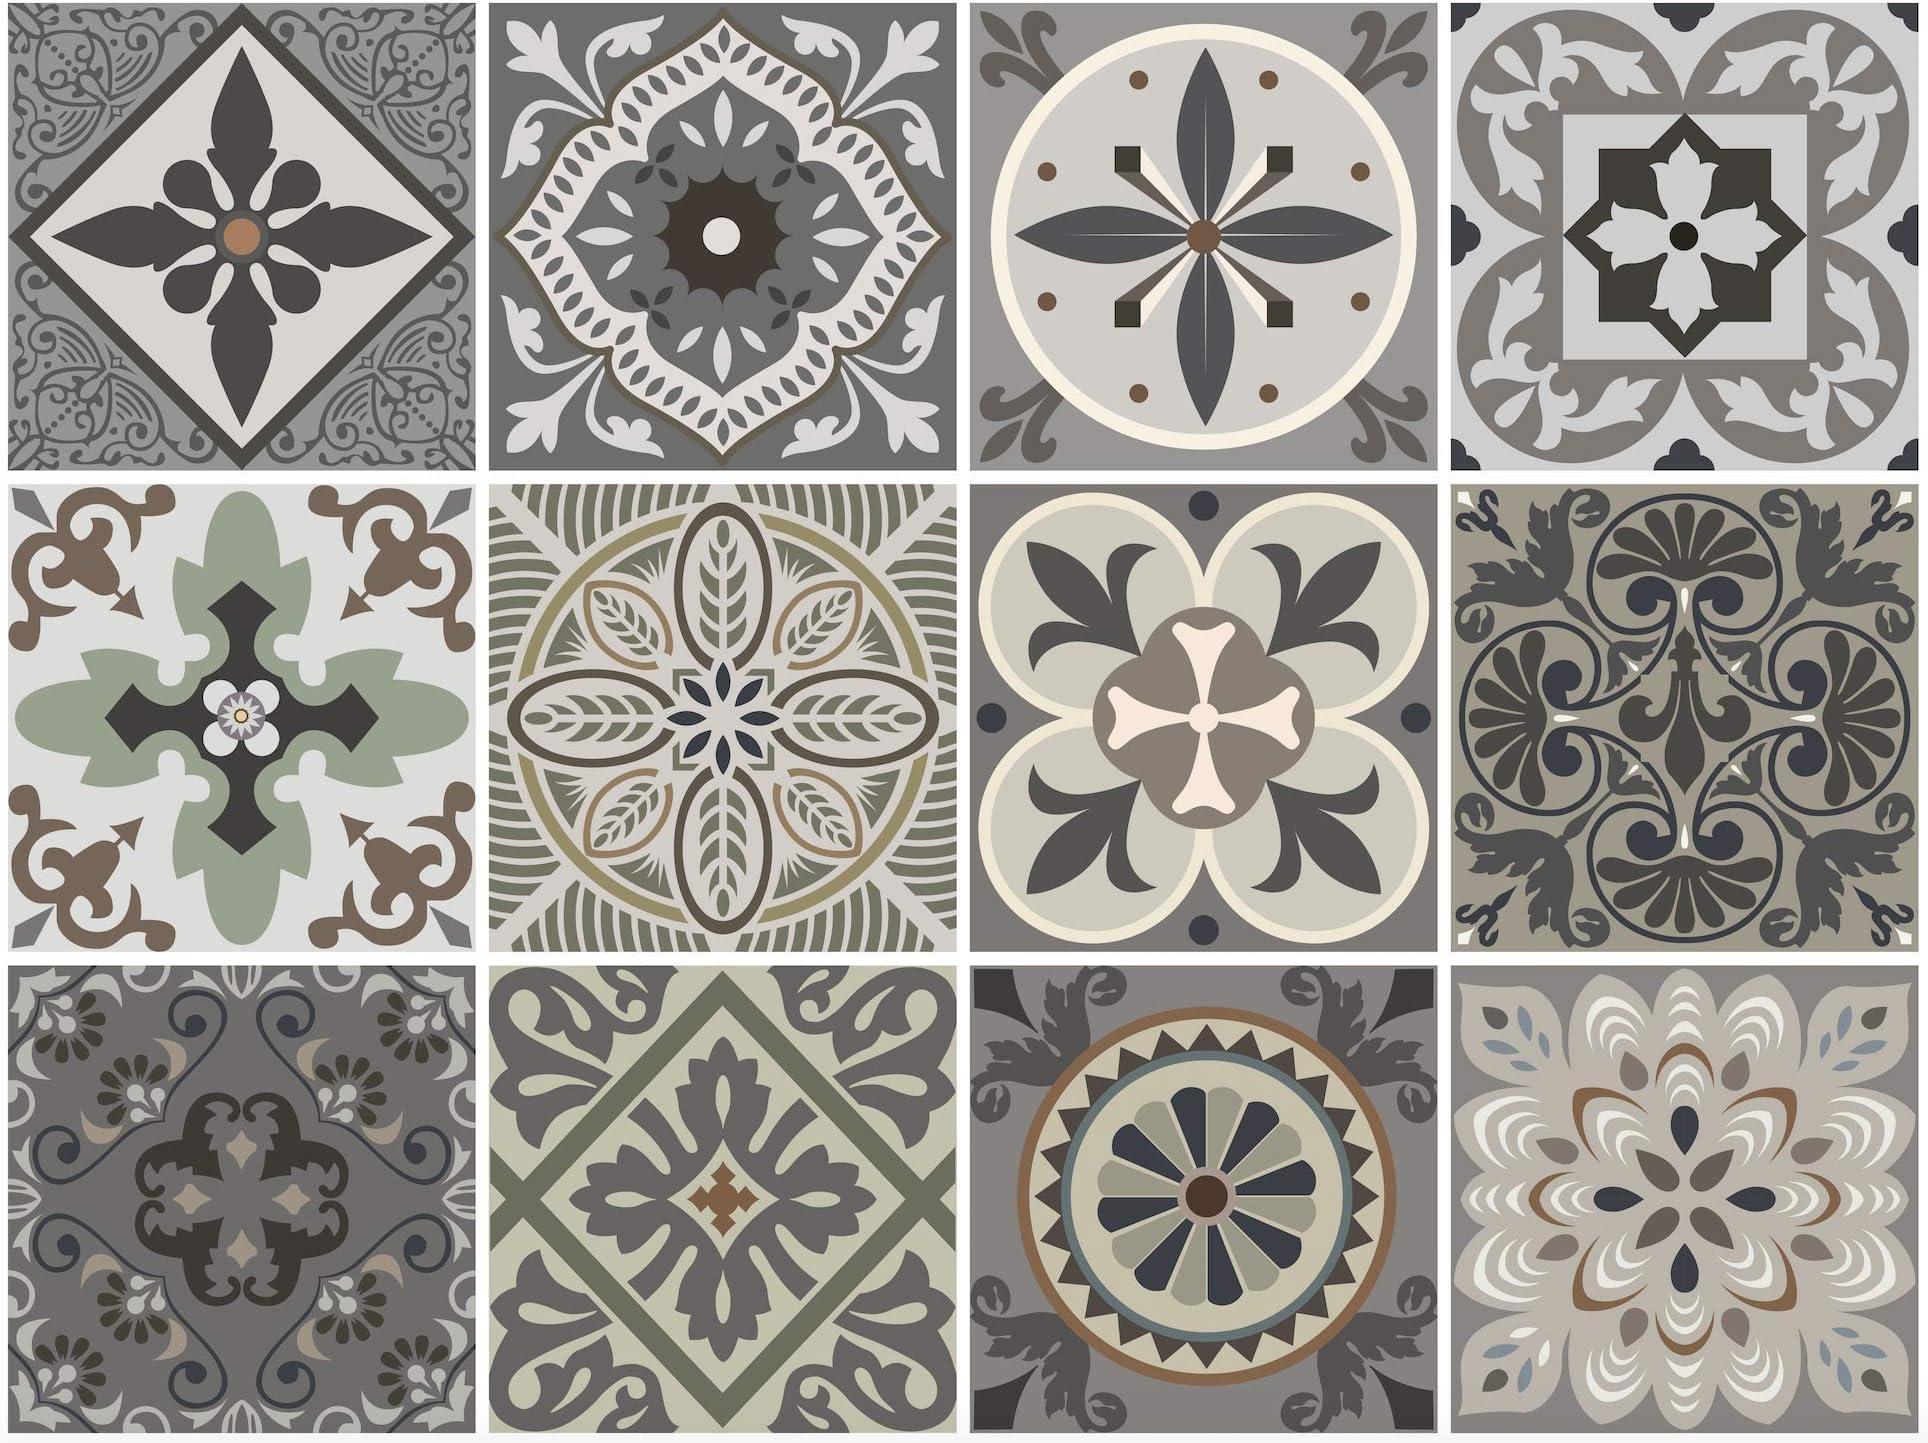 Venecia Decorative Tile Stickers Set 12 Units 6x6 inches. Peel & Stick Vinyl Tiles. Backsplash. Home Decor. Furniture Decor. Staircase Decor. 3 sqf per Package.